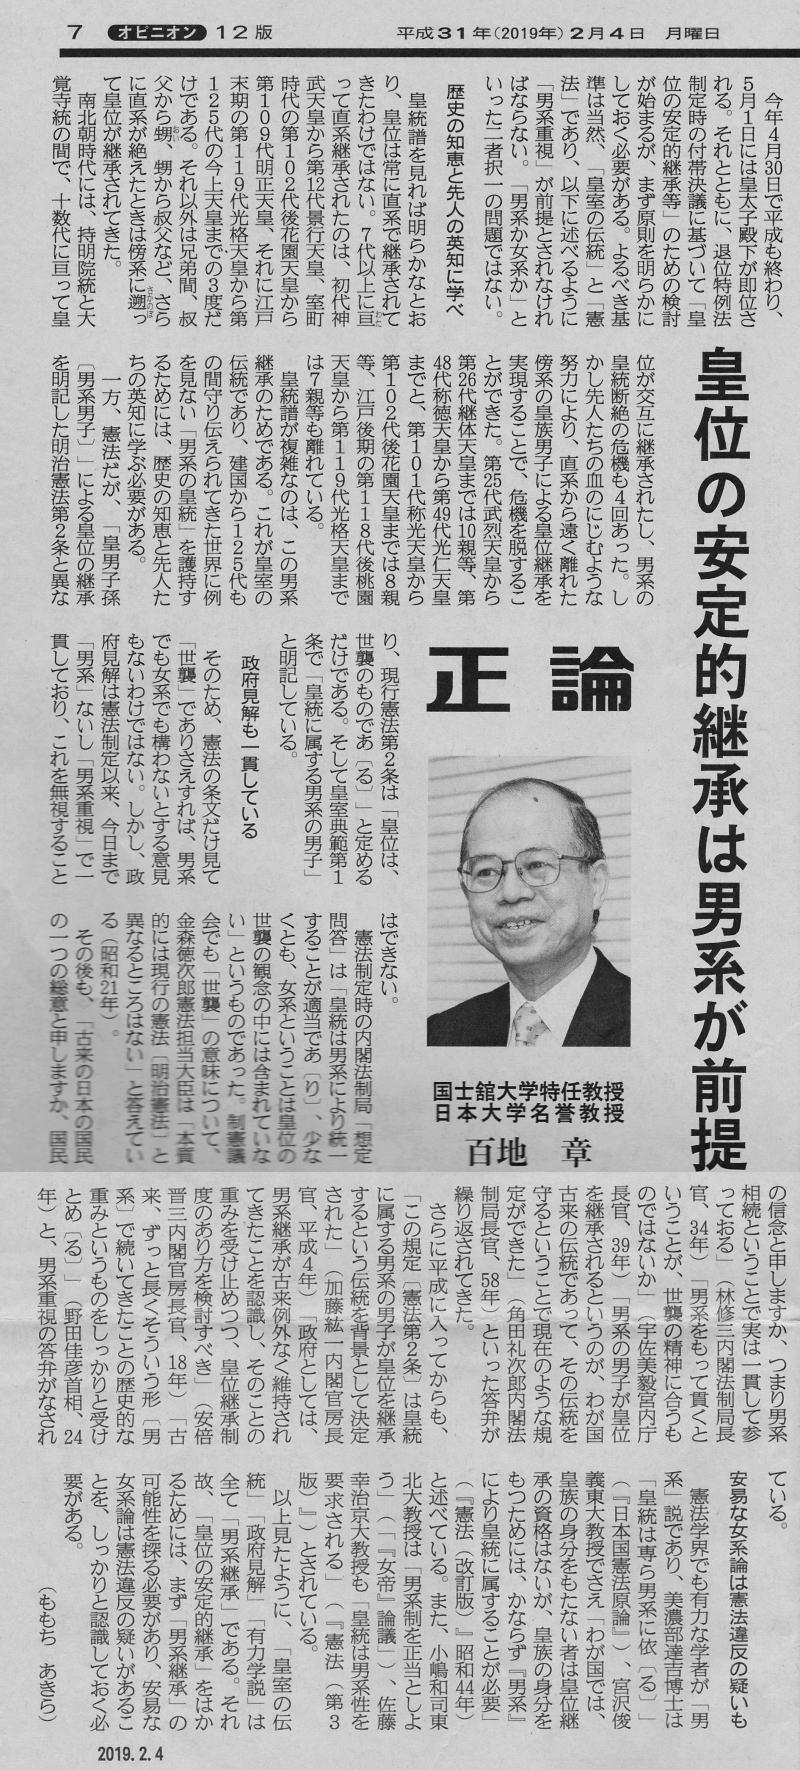 http://daishi100.cocolog-nifty.com/photos/uncategorized/20190204_sankei_momochi.jpg